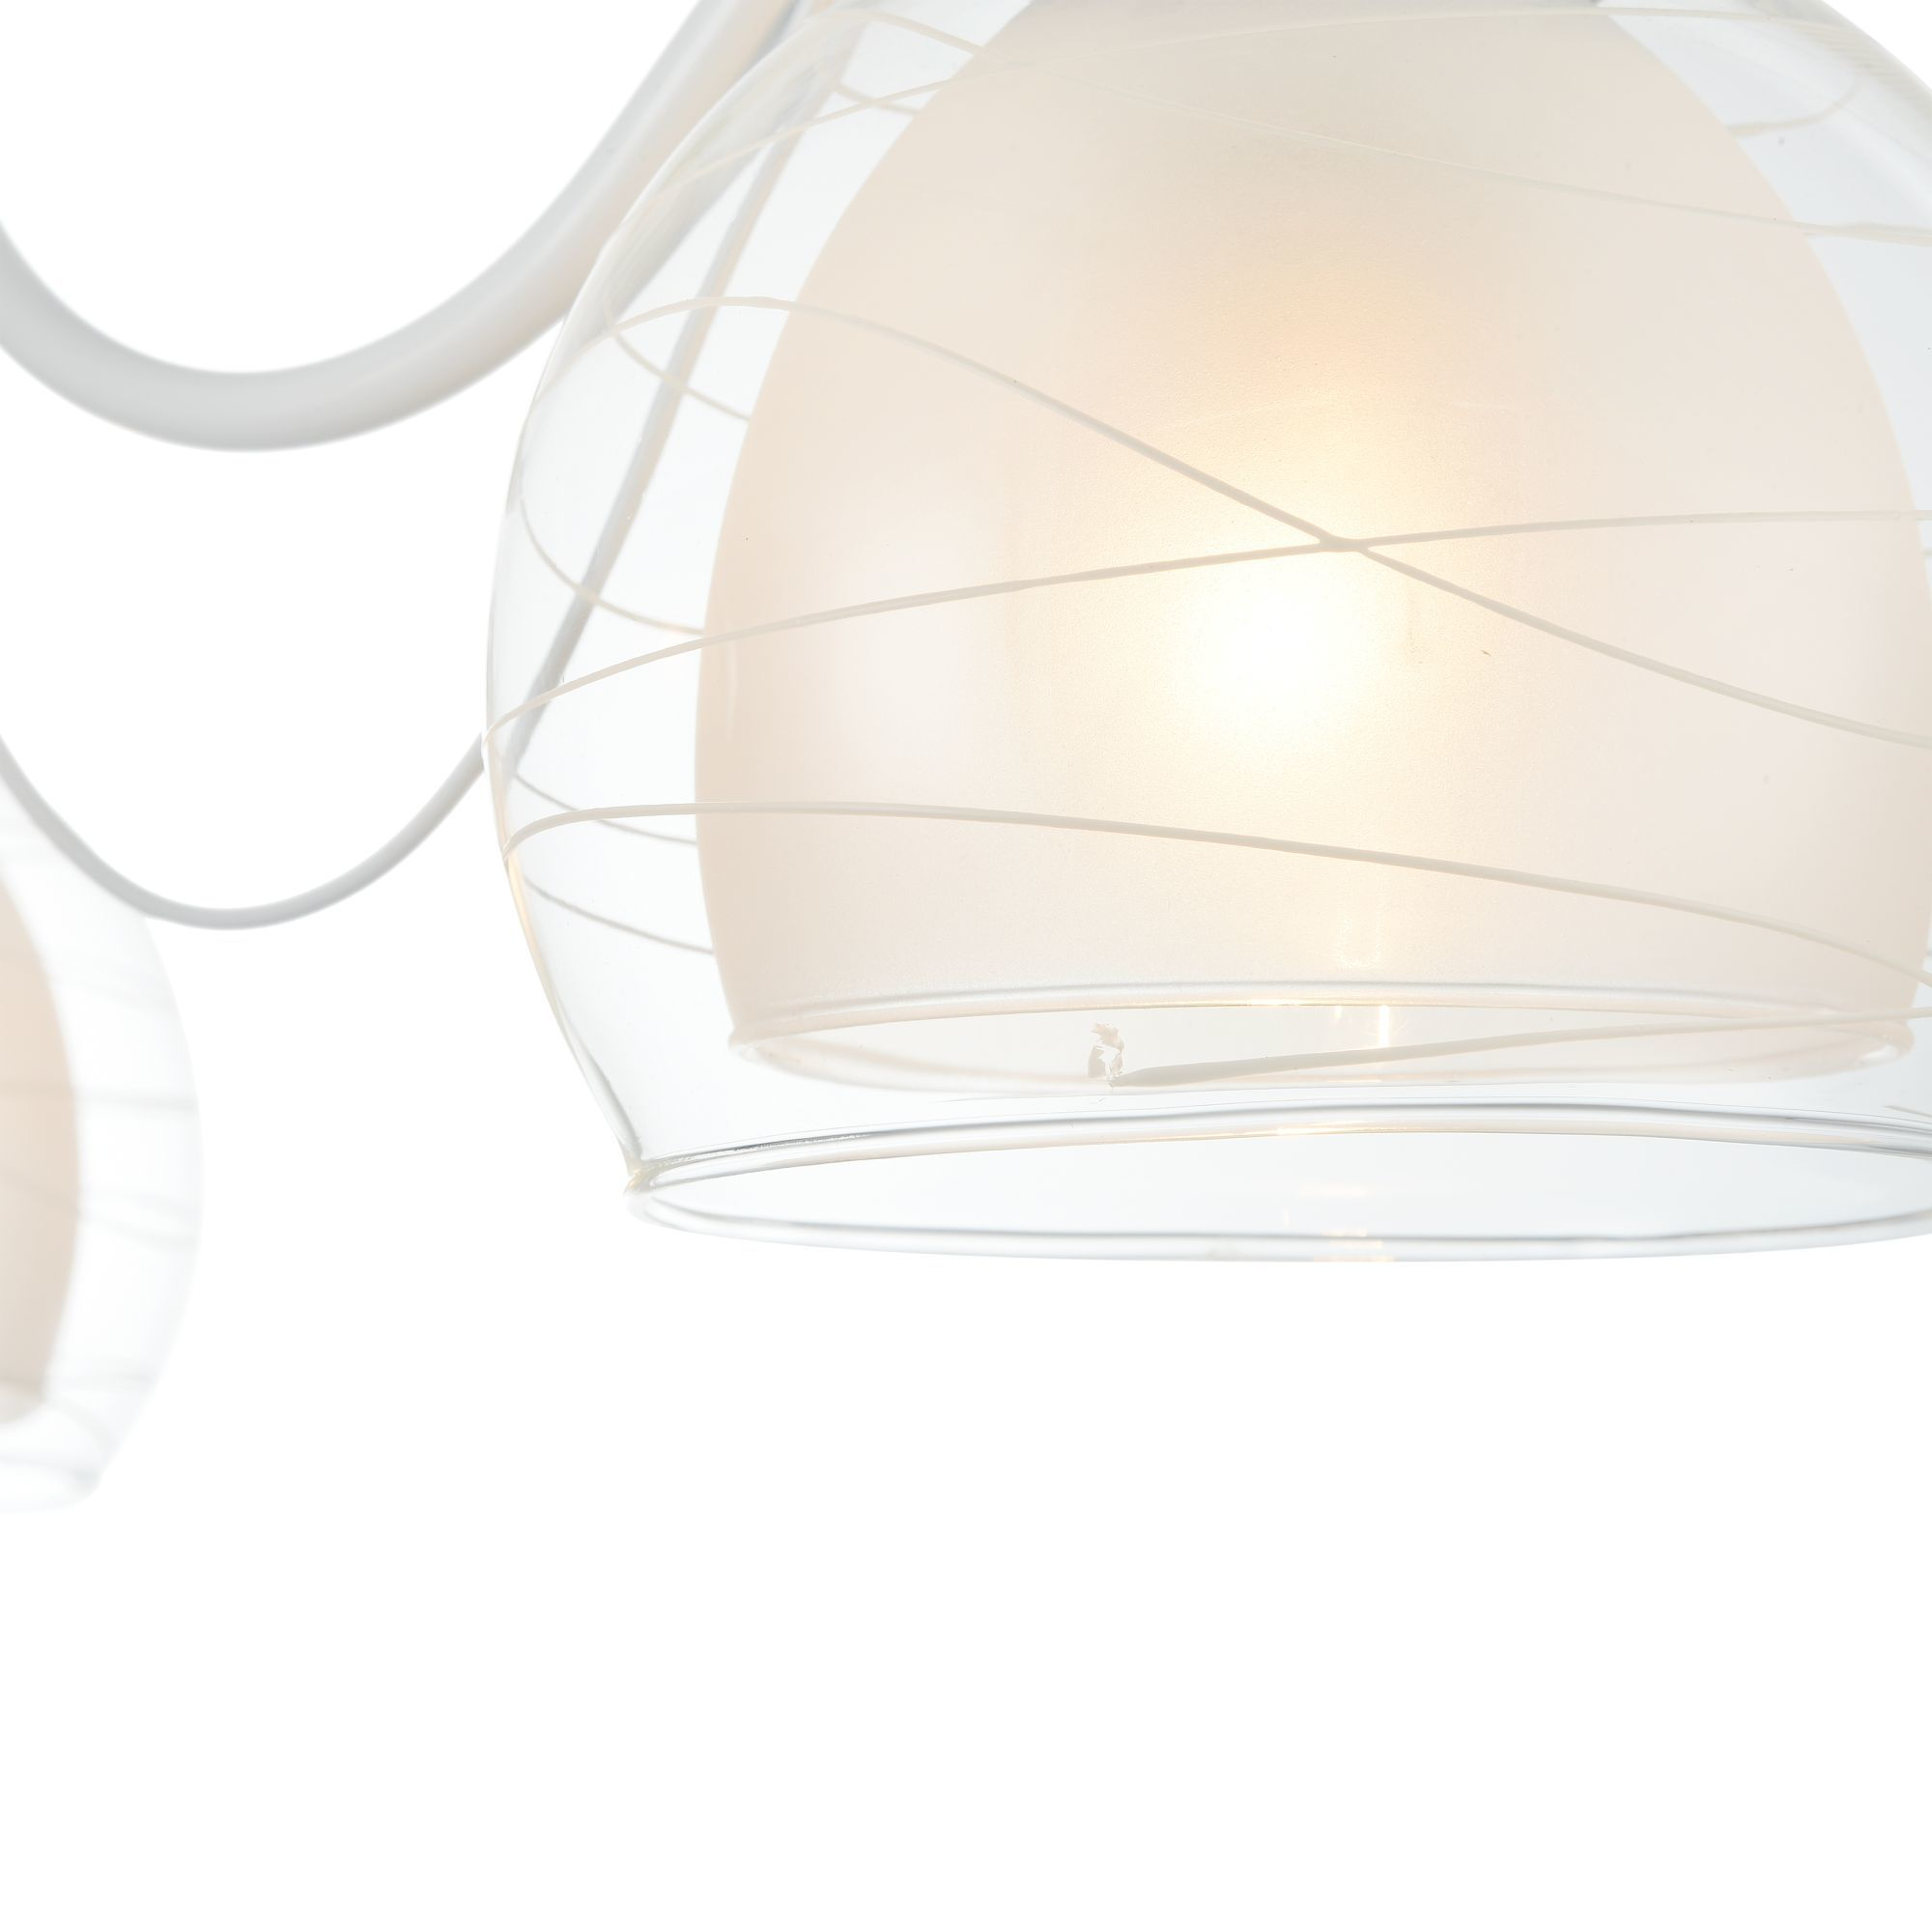 Потолочная люстра Freya Nikki FR5052-CL-03-W, 3xE14x60W, белый с никелем, белый с прозрачным, прозрачный с белым, металл, стекло - фото 8